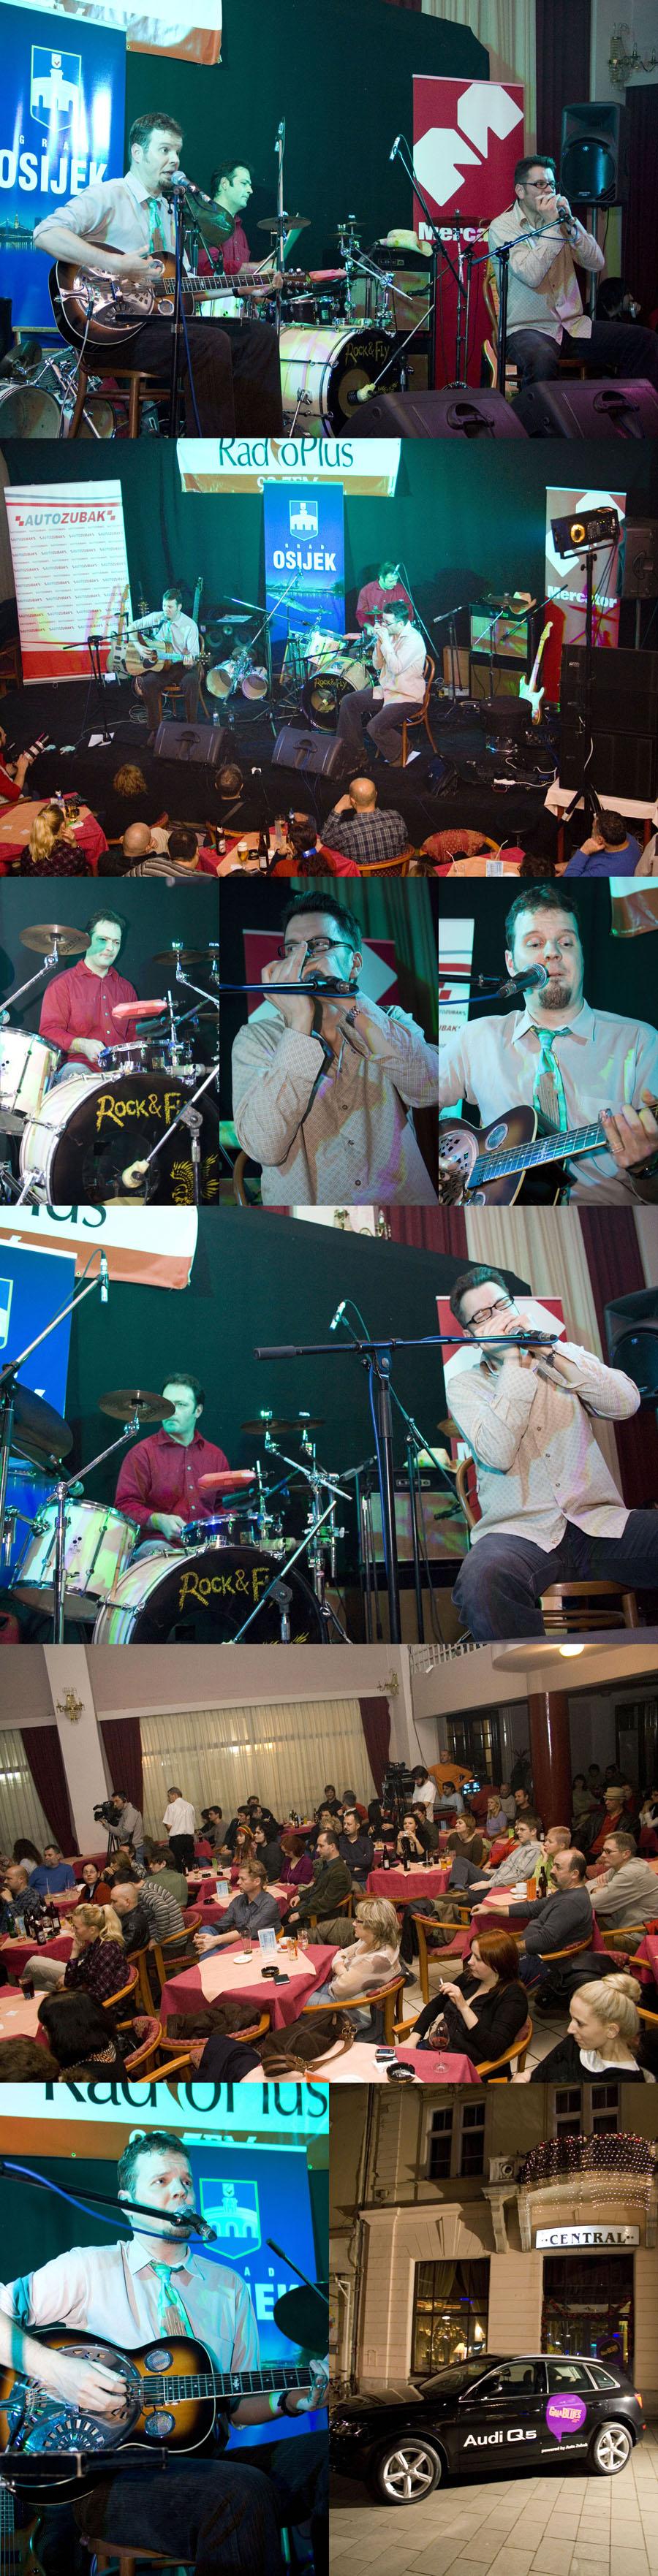 Rambling Blues Trio  [url=http://www.osijek031.com/osijek.php?najava_id=15550]4. Međunarodni gala blues festival - Osijek 2008[/url]  Foto: Daniel Antunović  Ključne riječi: gala blues festival rambling